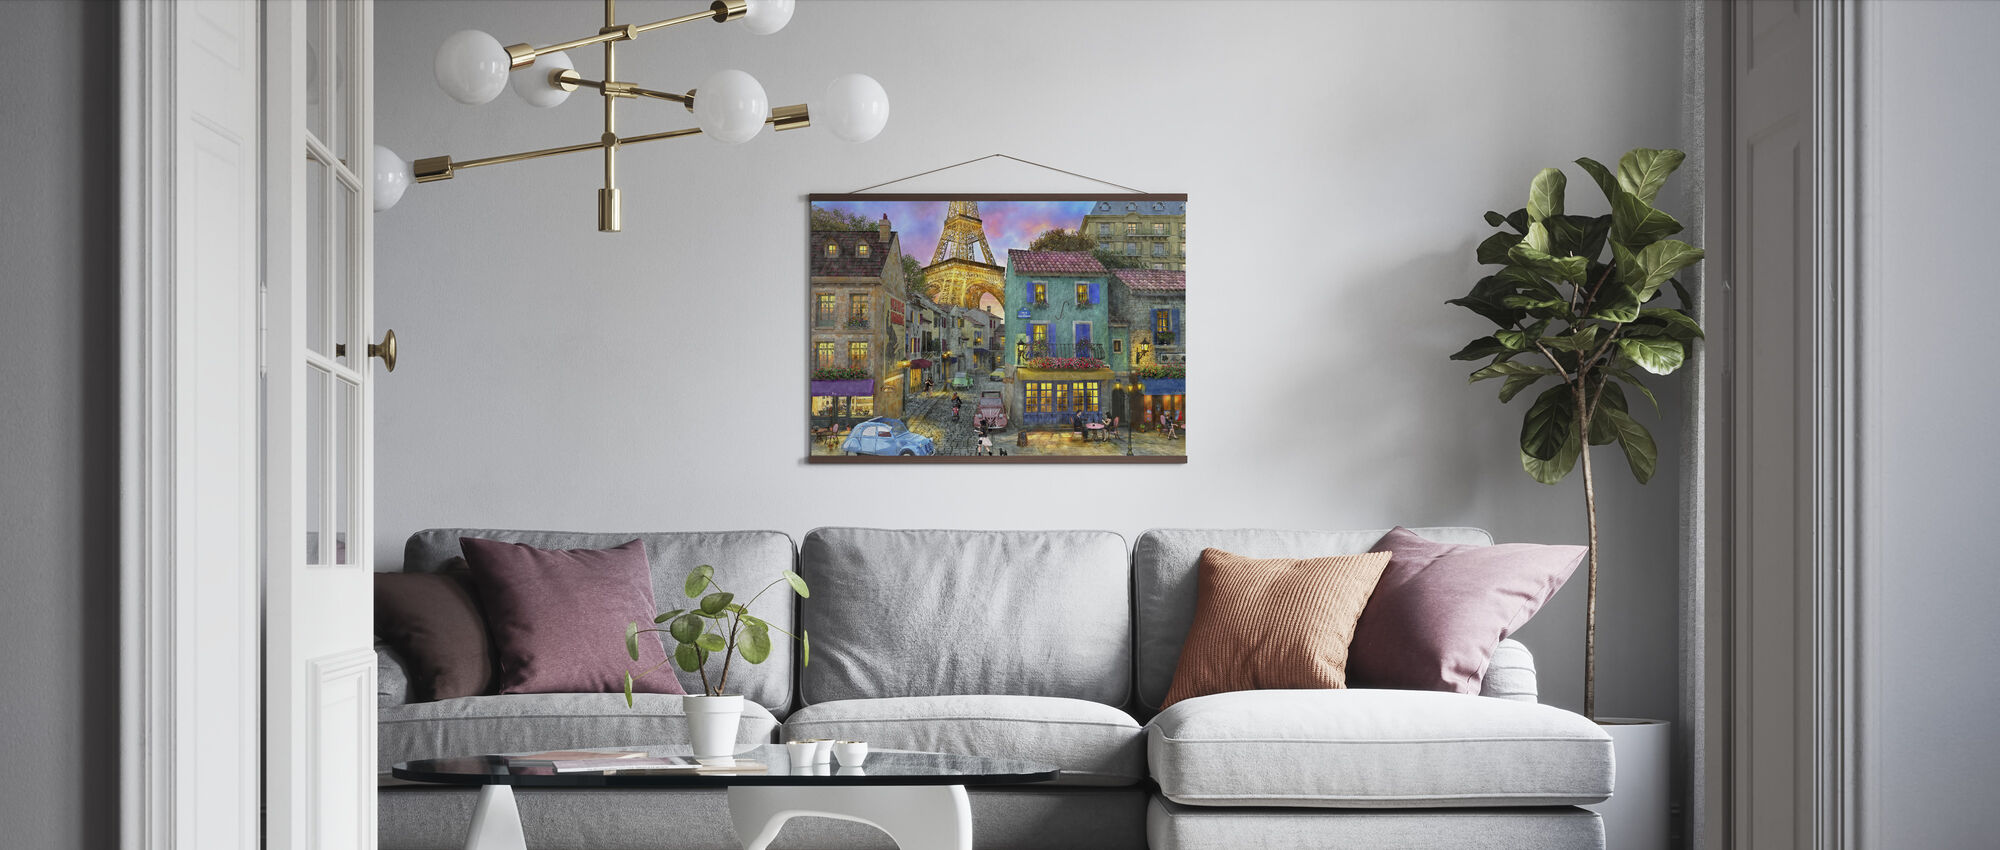 Paris Streets - Poster - Living Room